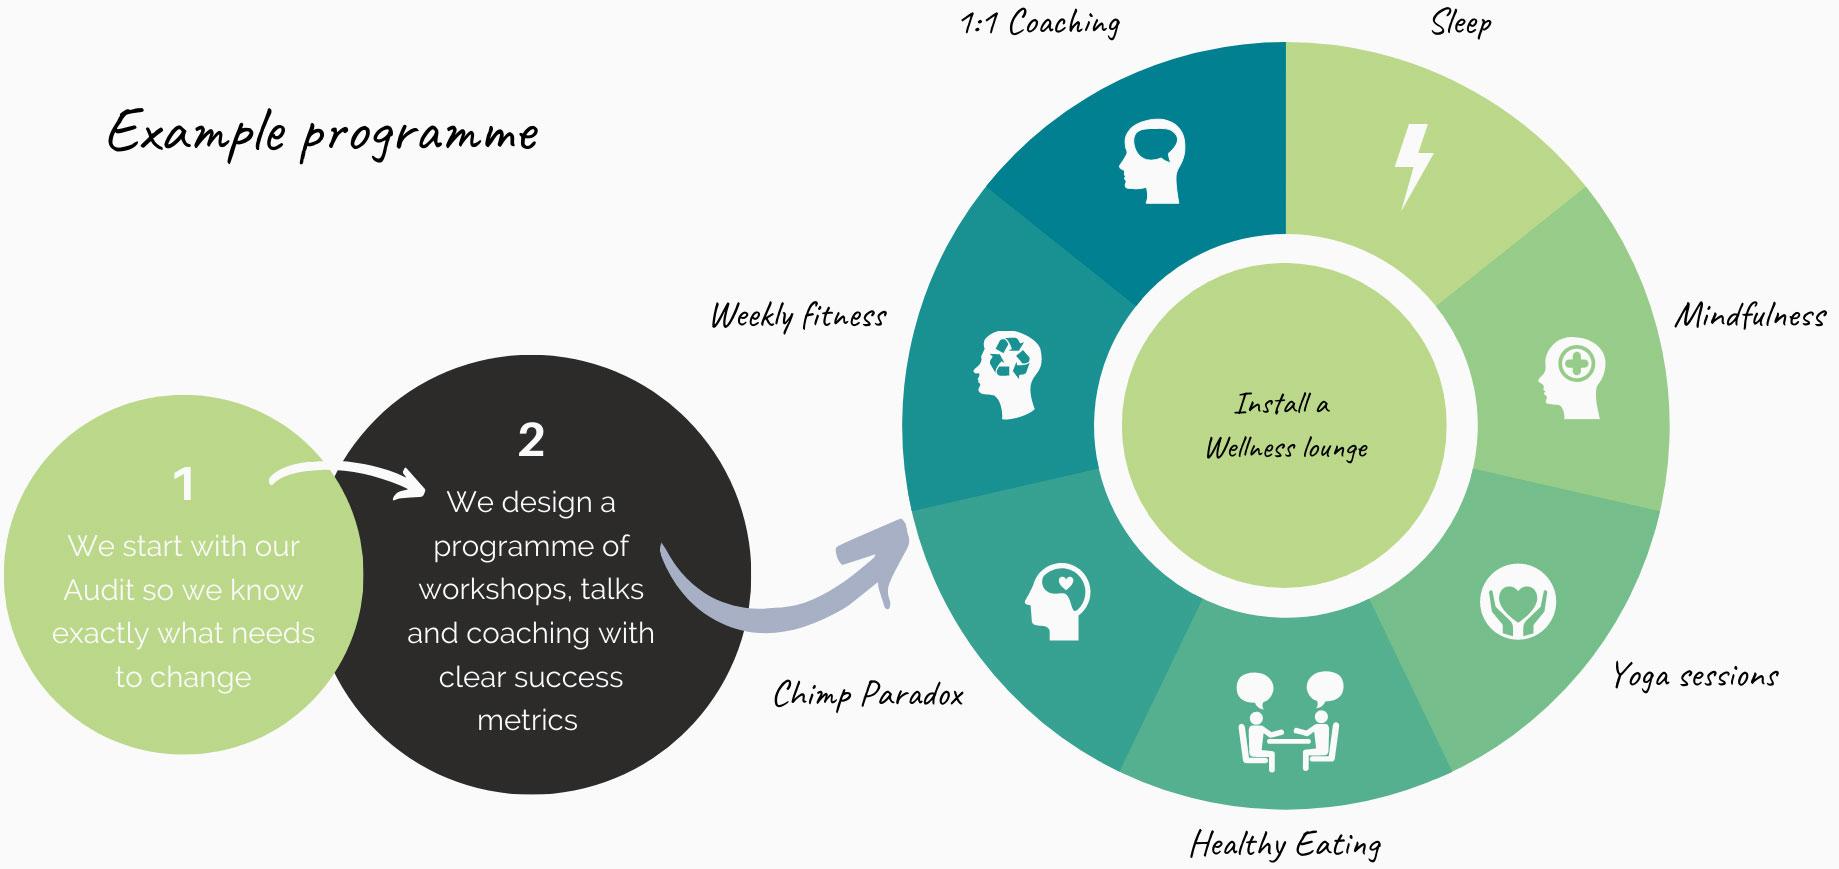 Company Wellness program